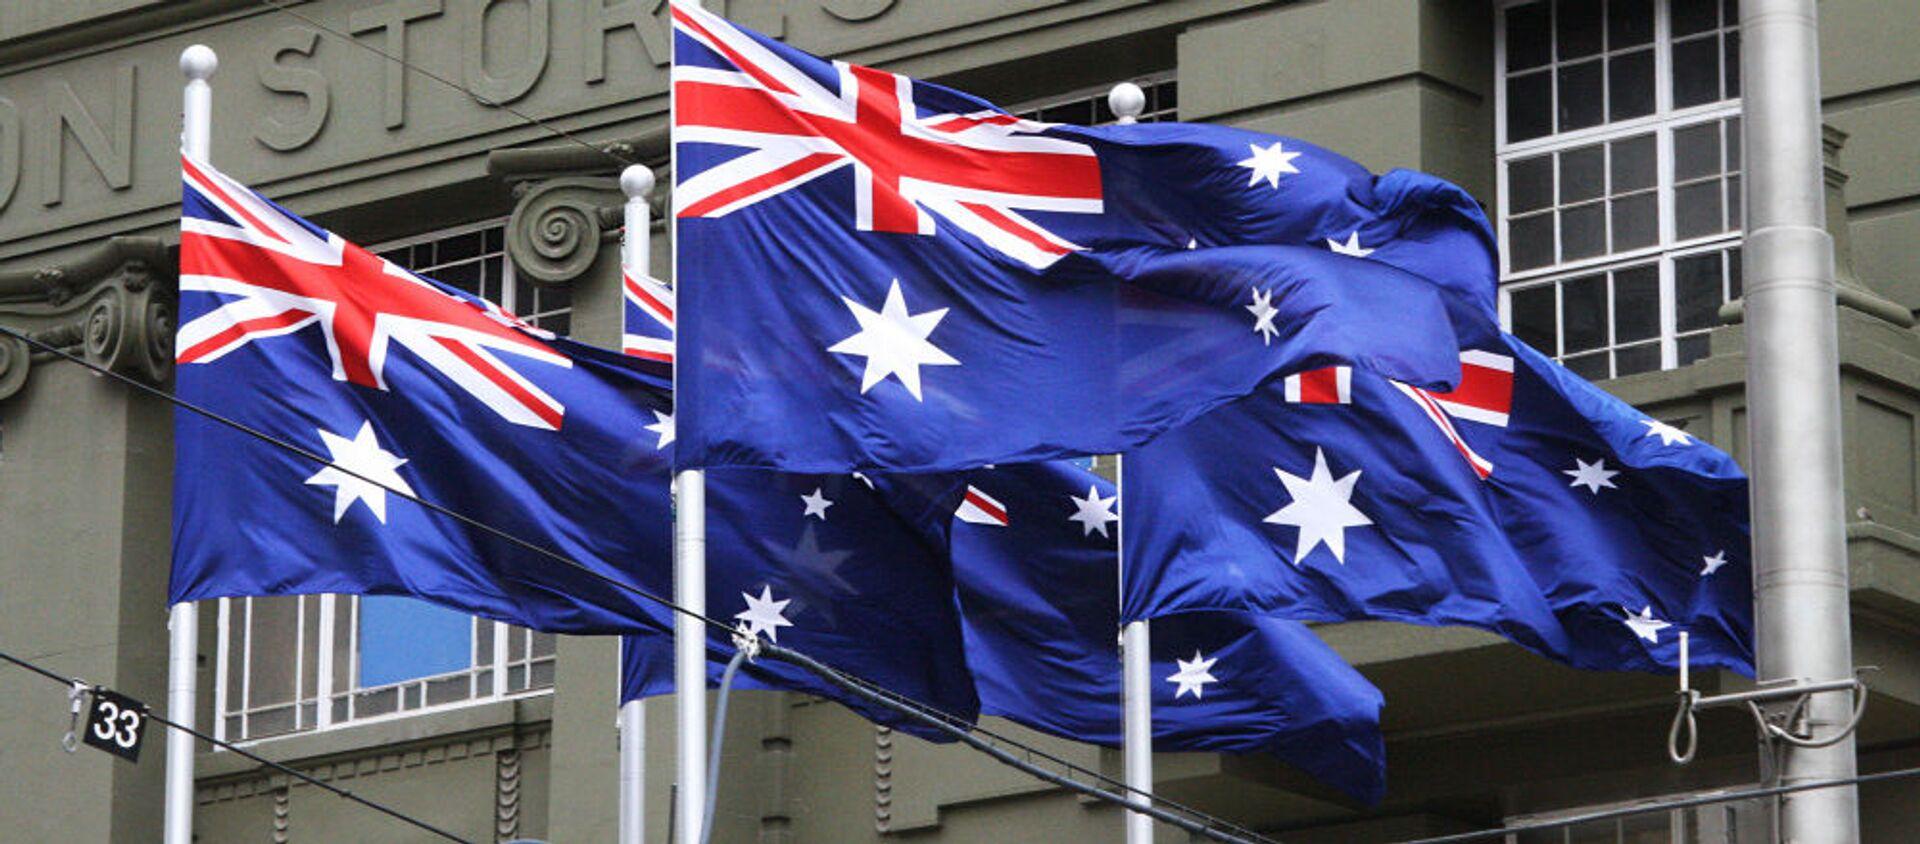 Quốc kỳ Úc - Sputnik Việt Nam, 1920, 22.09.2021